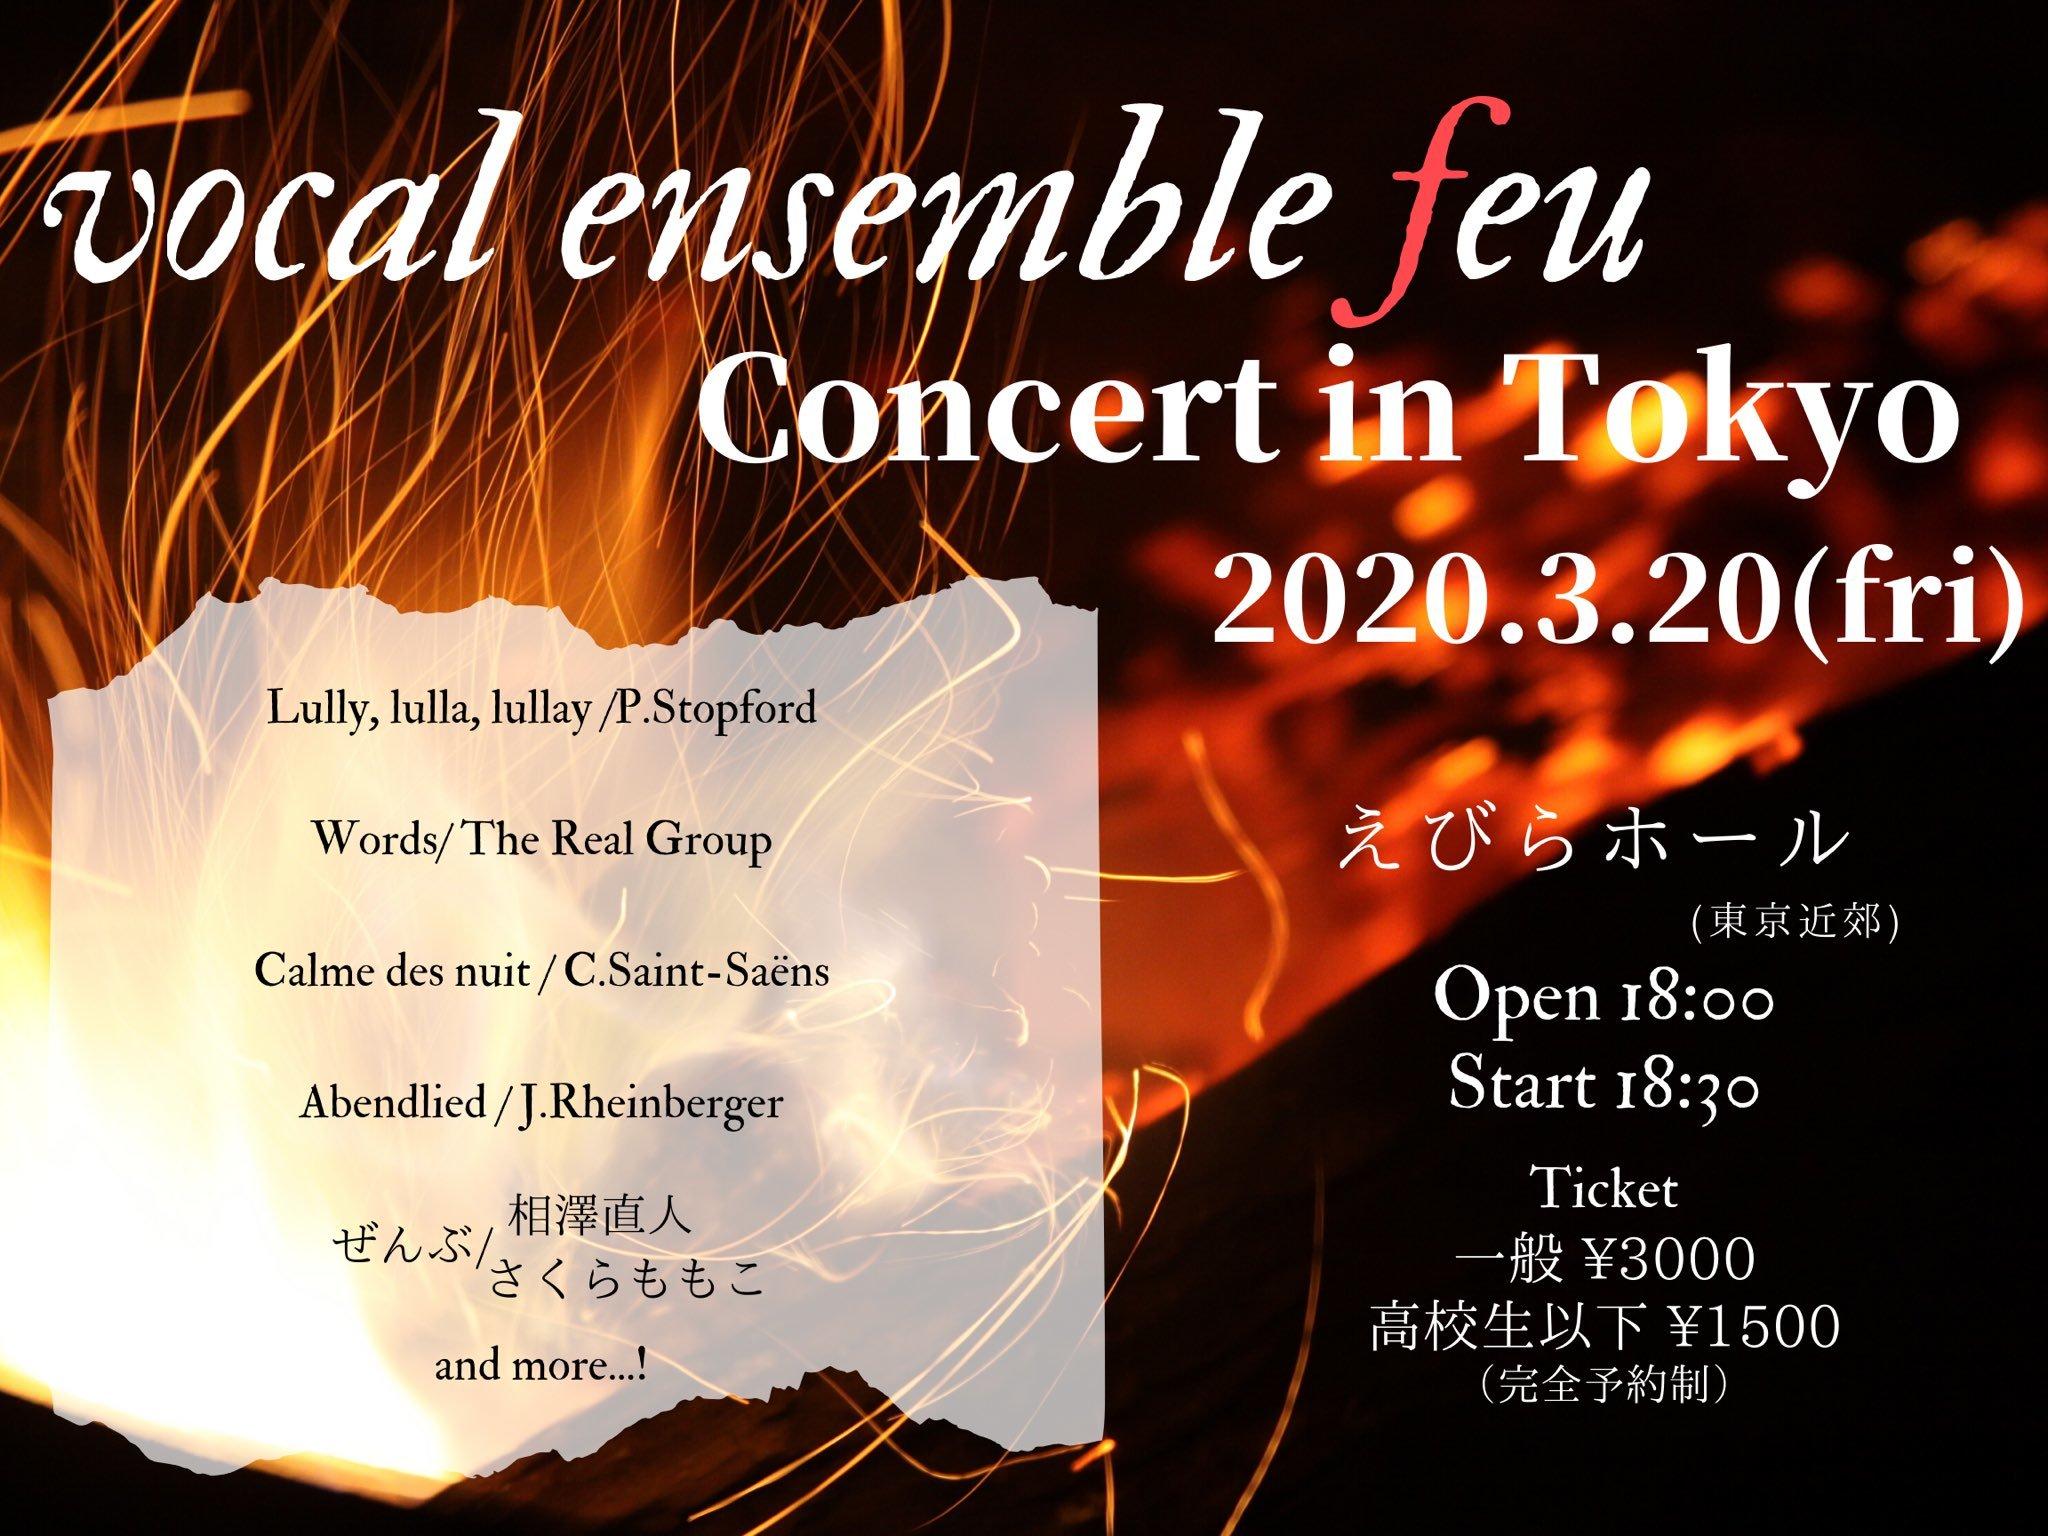 Vocal Ensemble feu @3/20 (祝)待望の東京公演 までのカウントダウン!_a0157409_09290810.jpeg